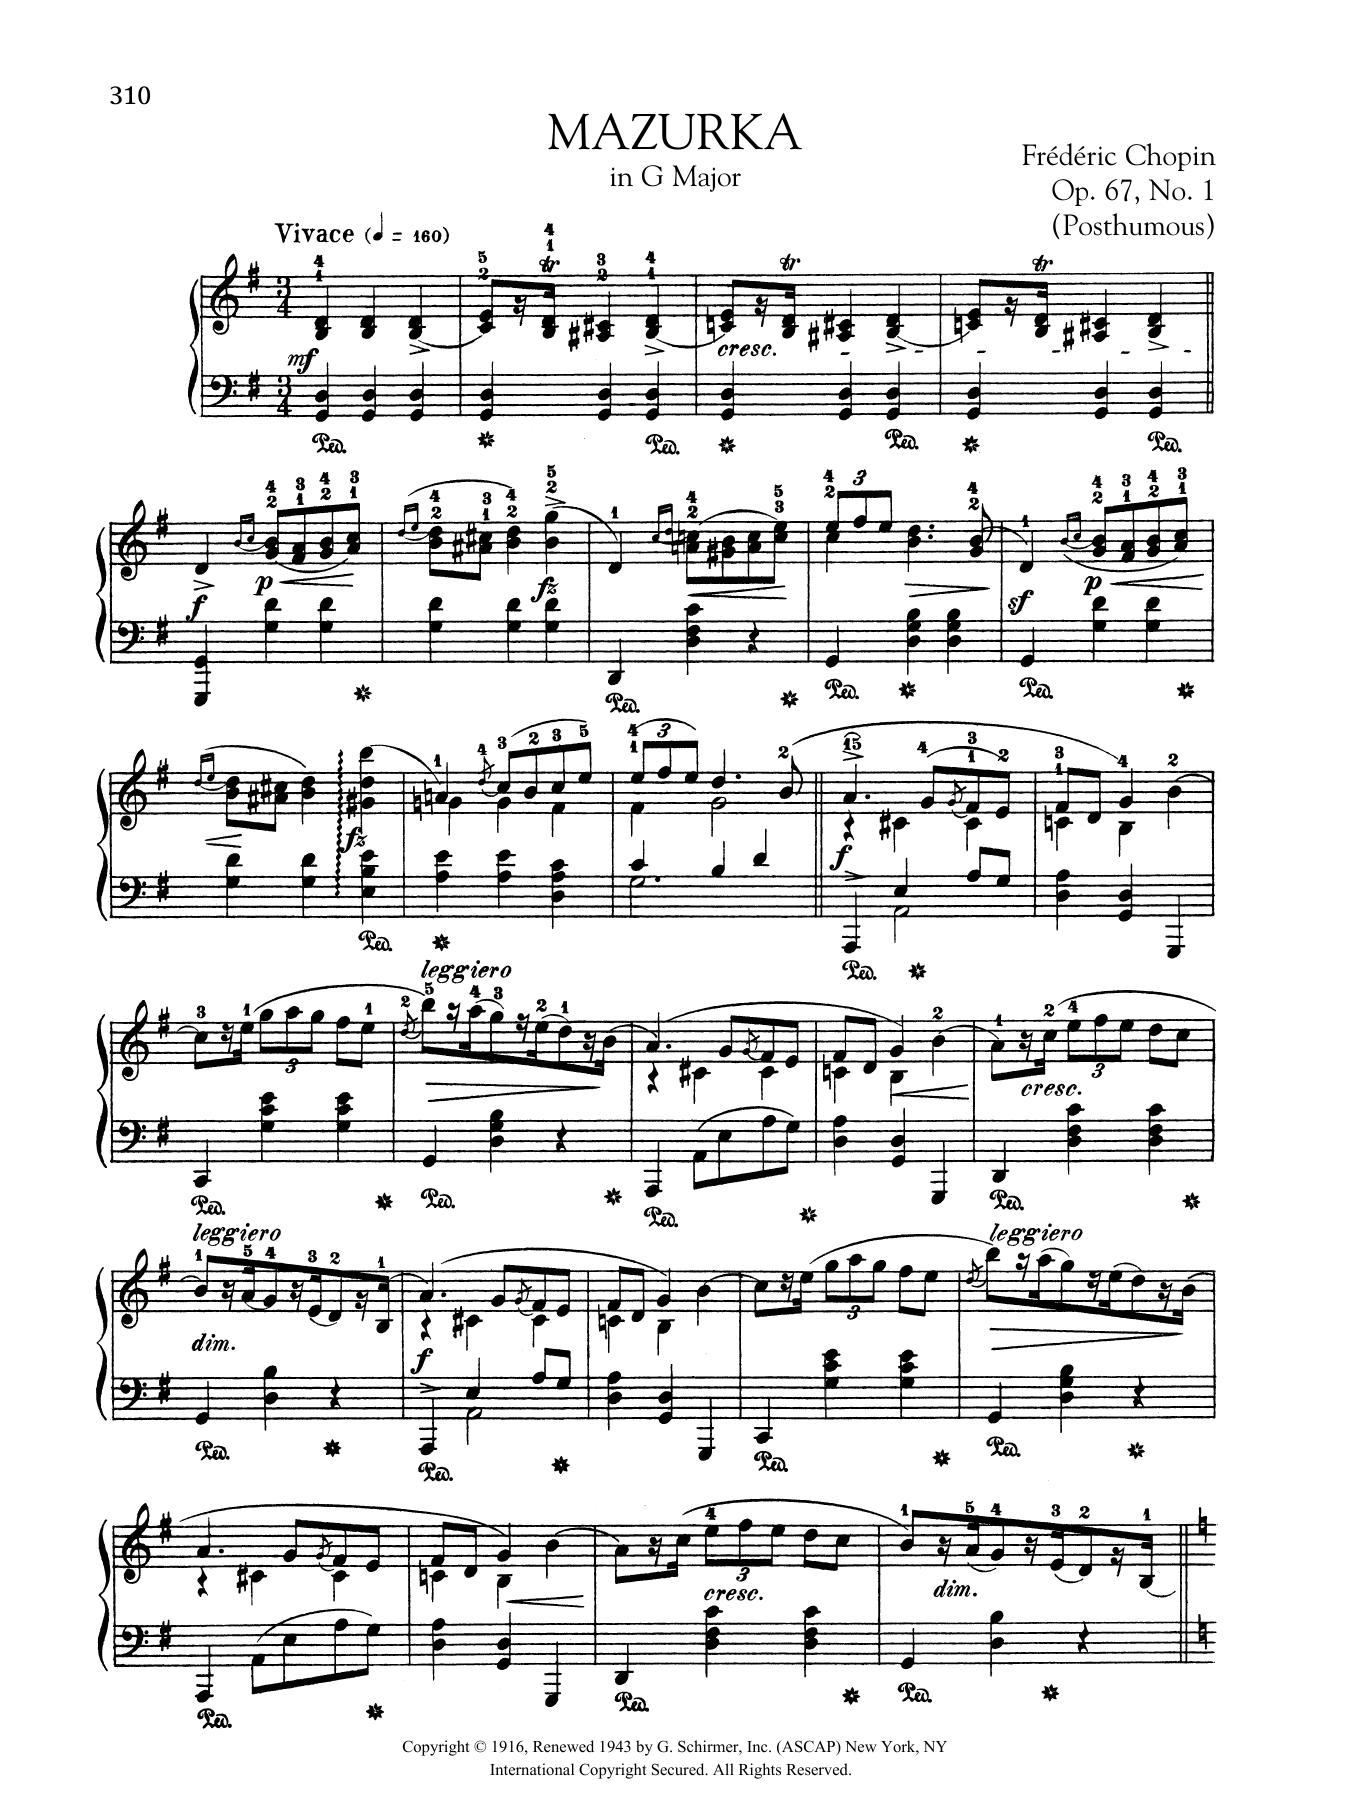 Mazurka in G Major, Op. 67, No. 1 (Posthumous) Sheet Music